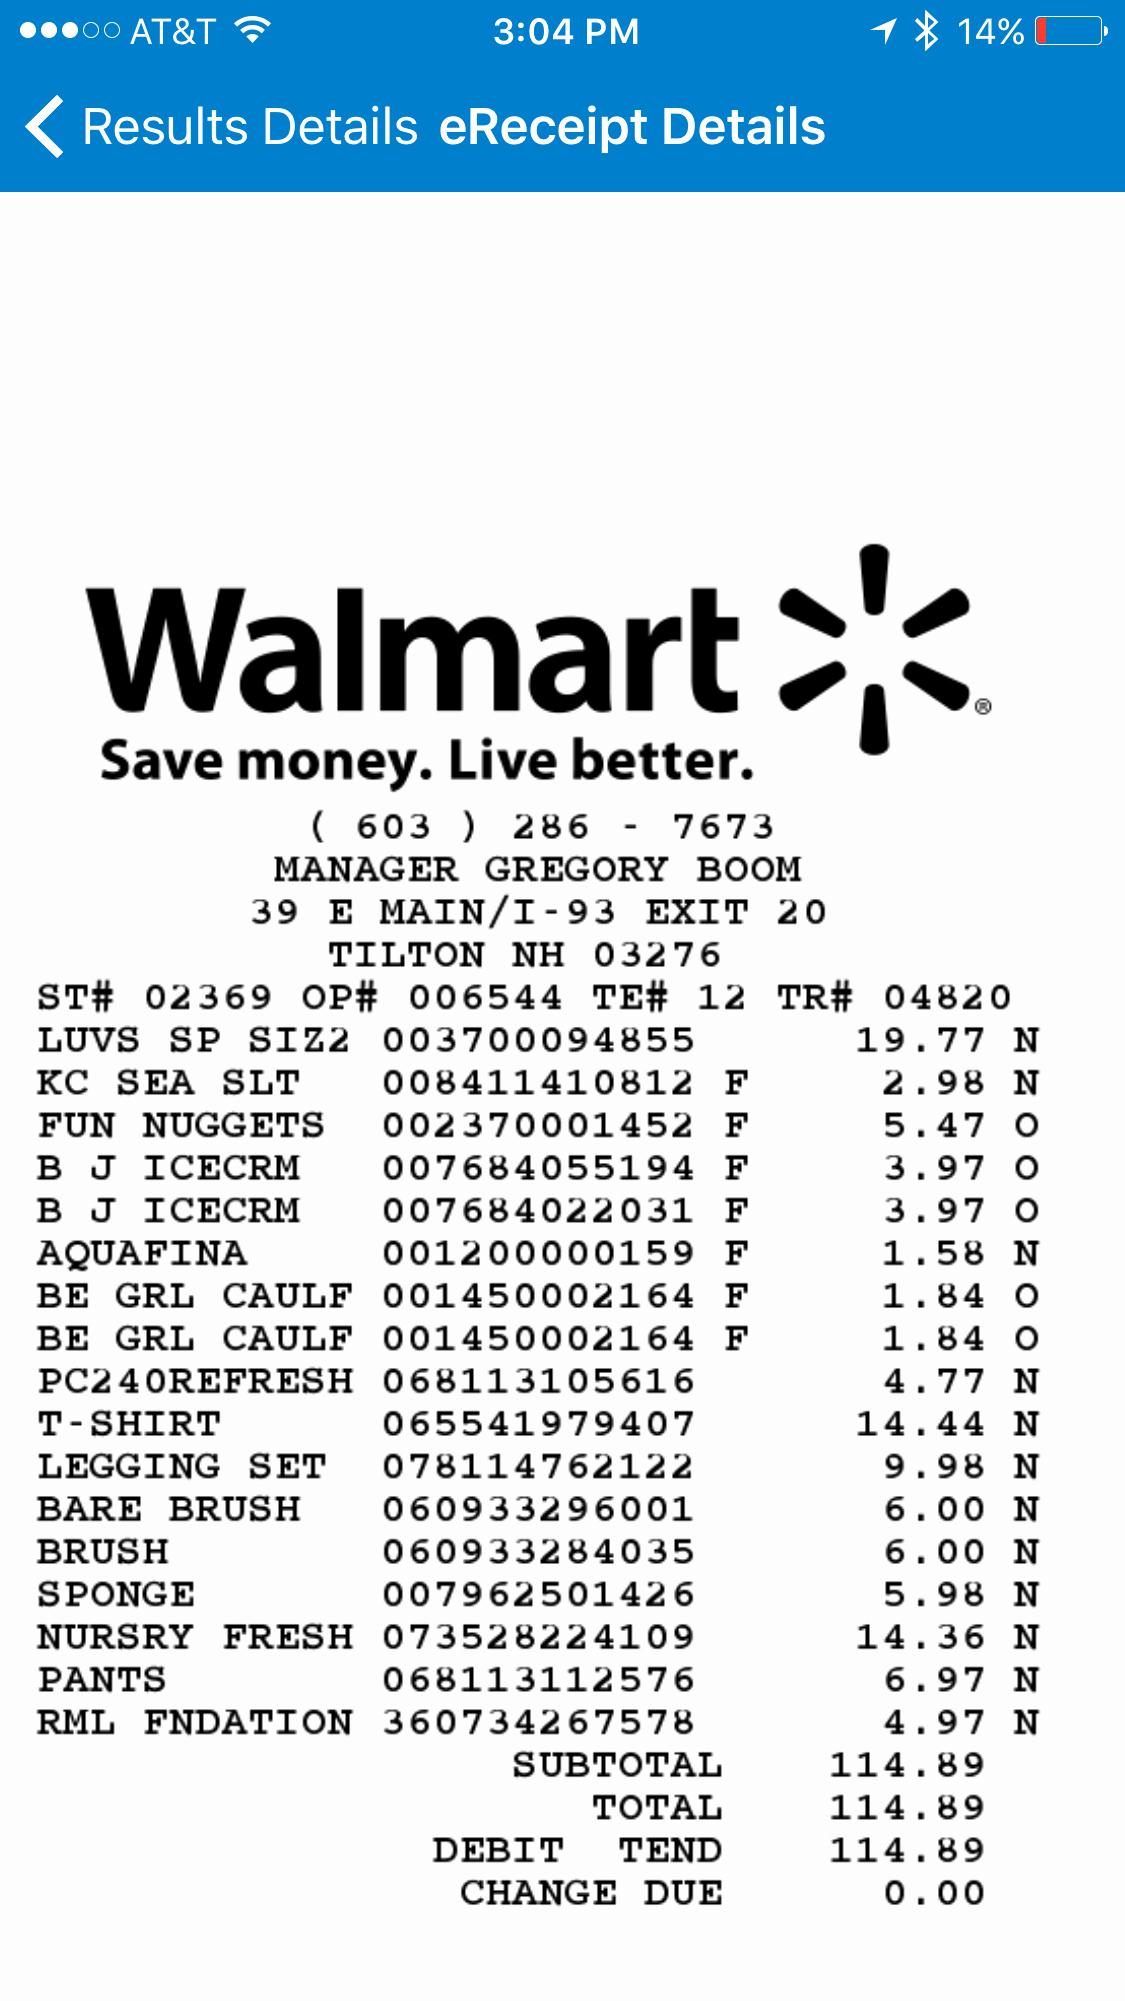 Online Walmart Receipt Maker Beautiful Walmart Receipt Generator